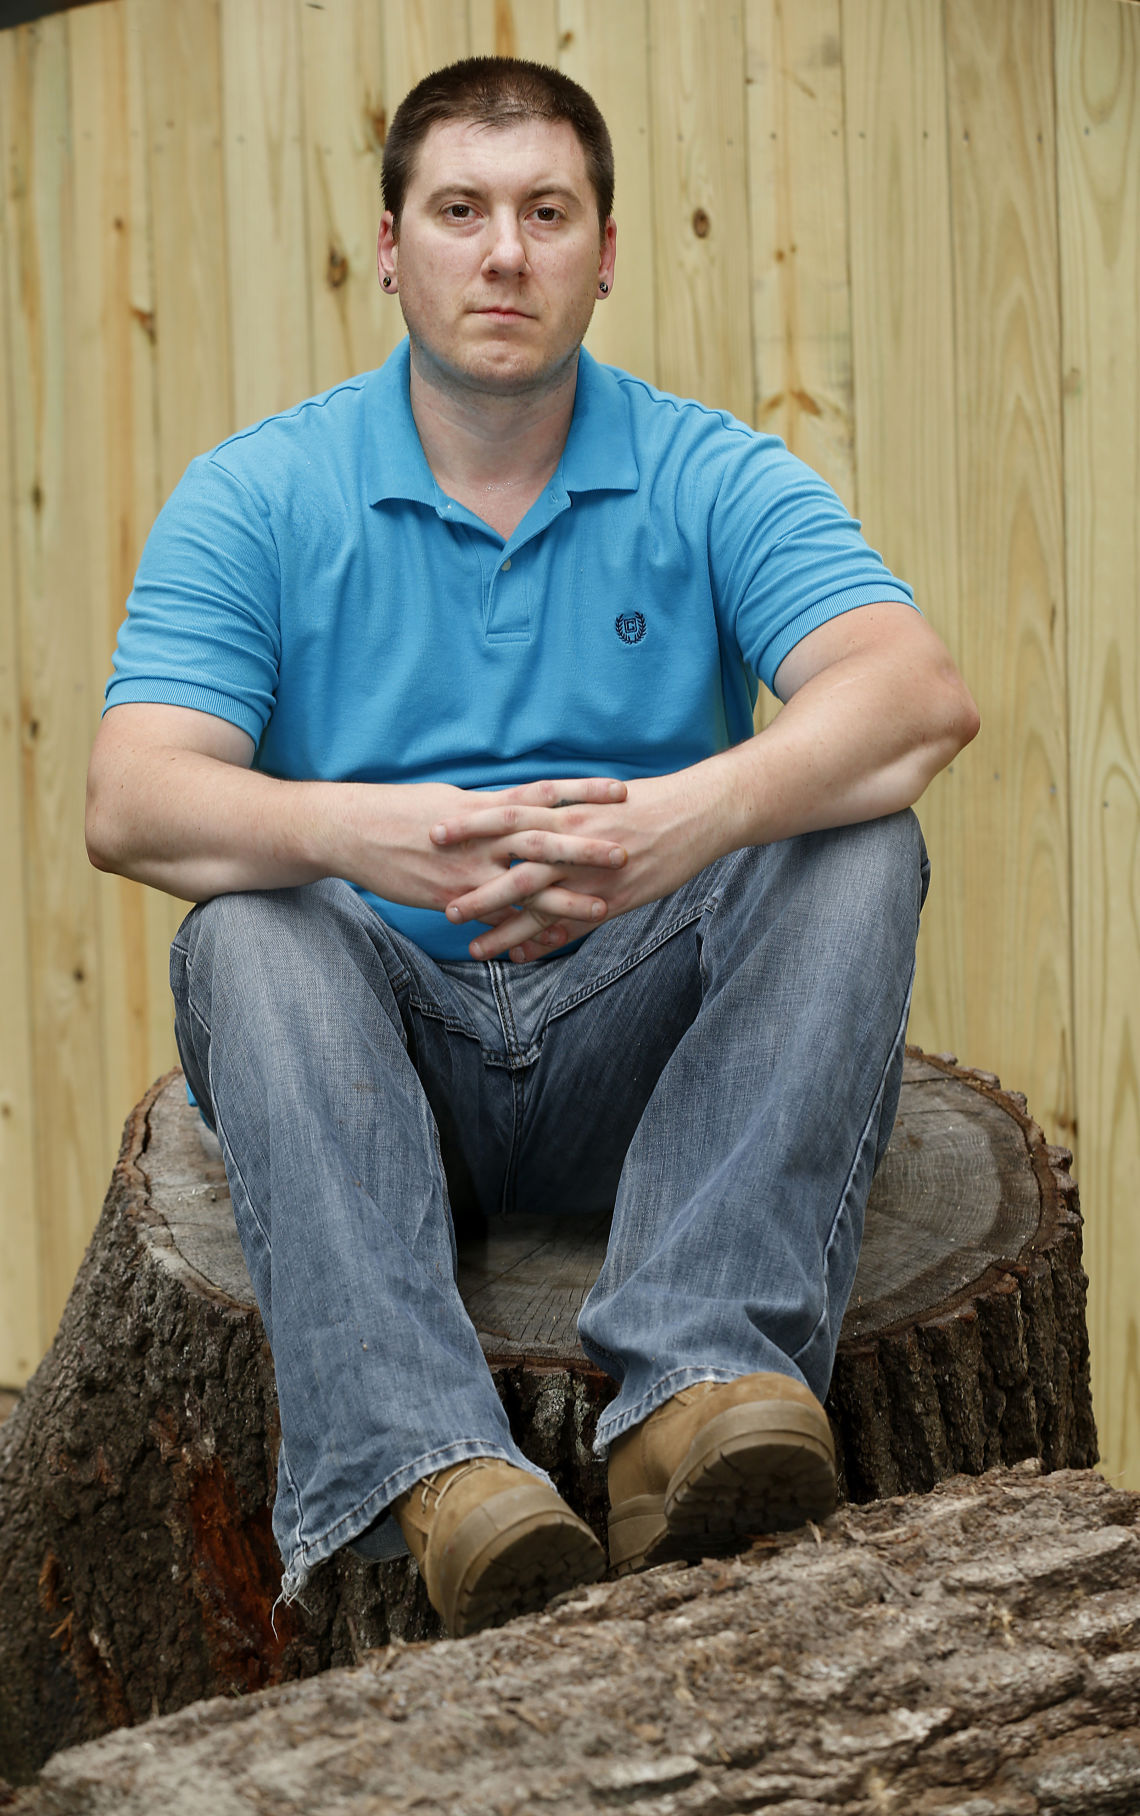 Richmond-area veteran with PTSD struggles against VA system to